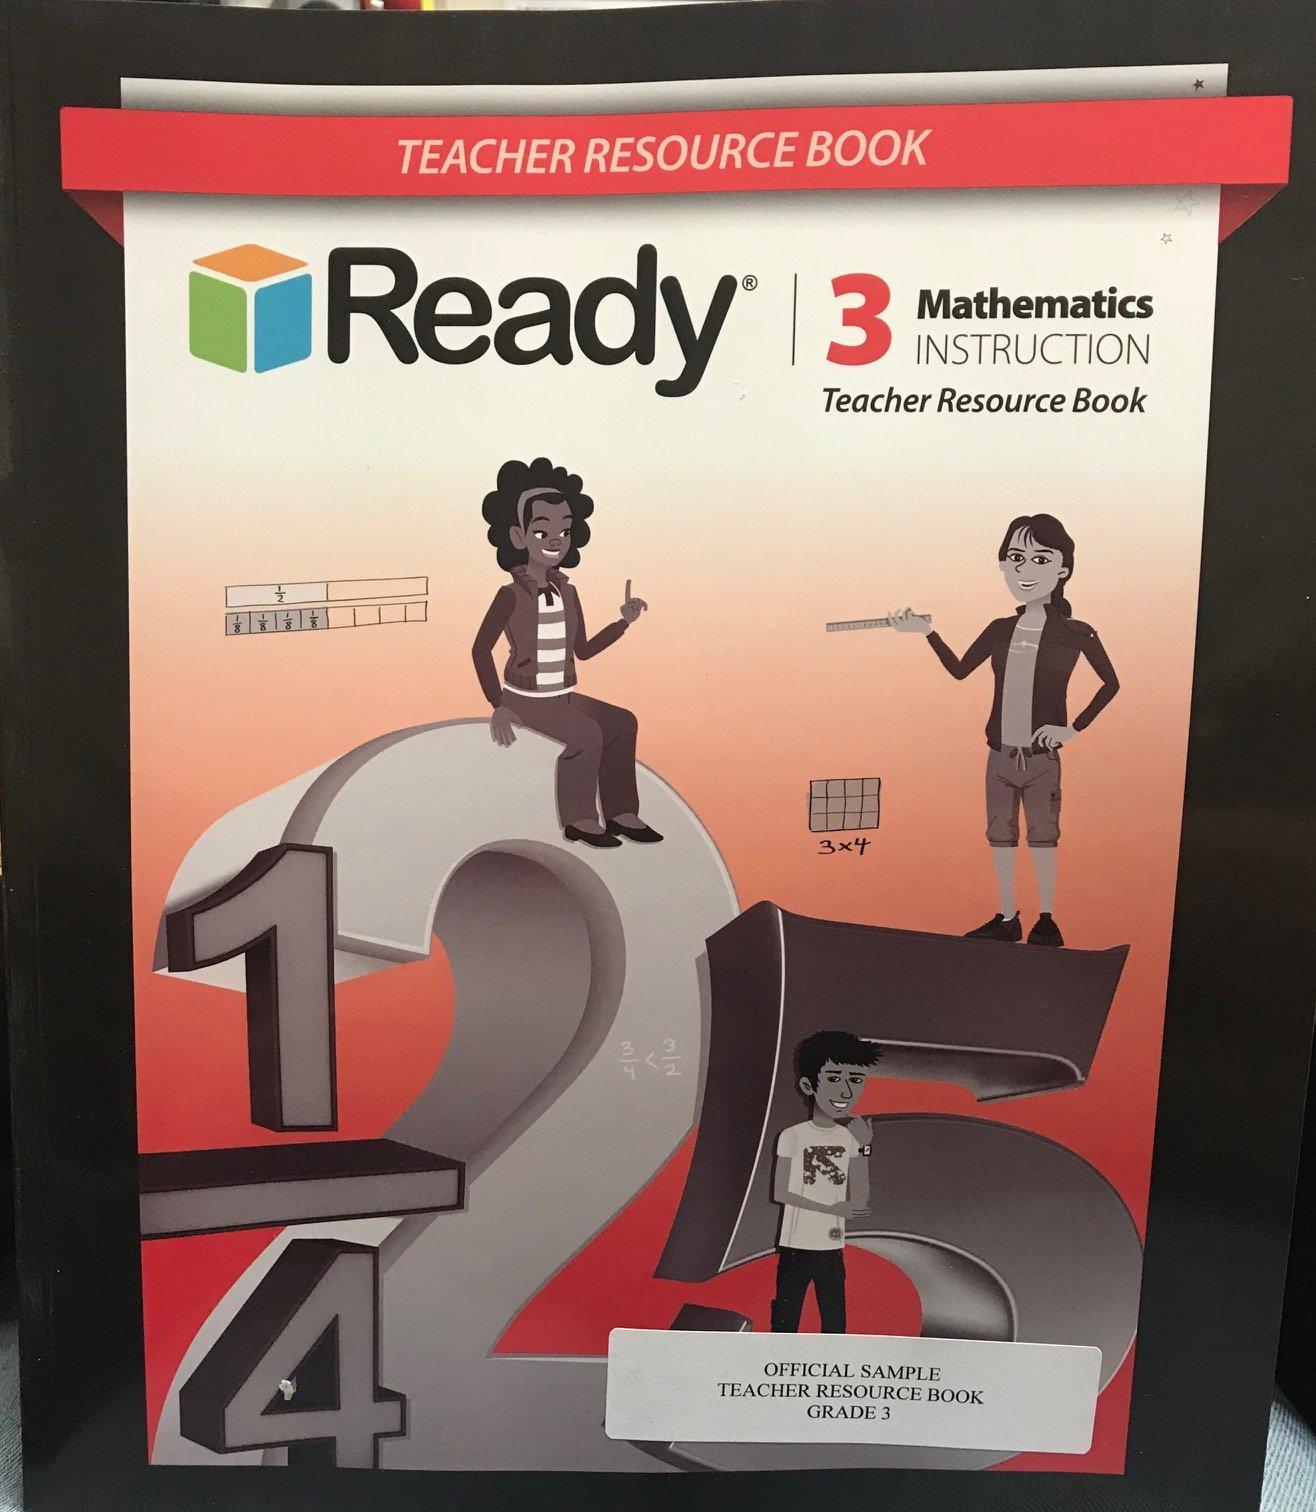 Download Ready 3 Mathematics Instruction Teachers Resource Book ebook